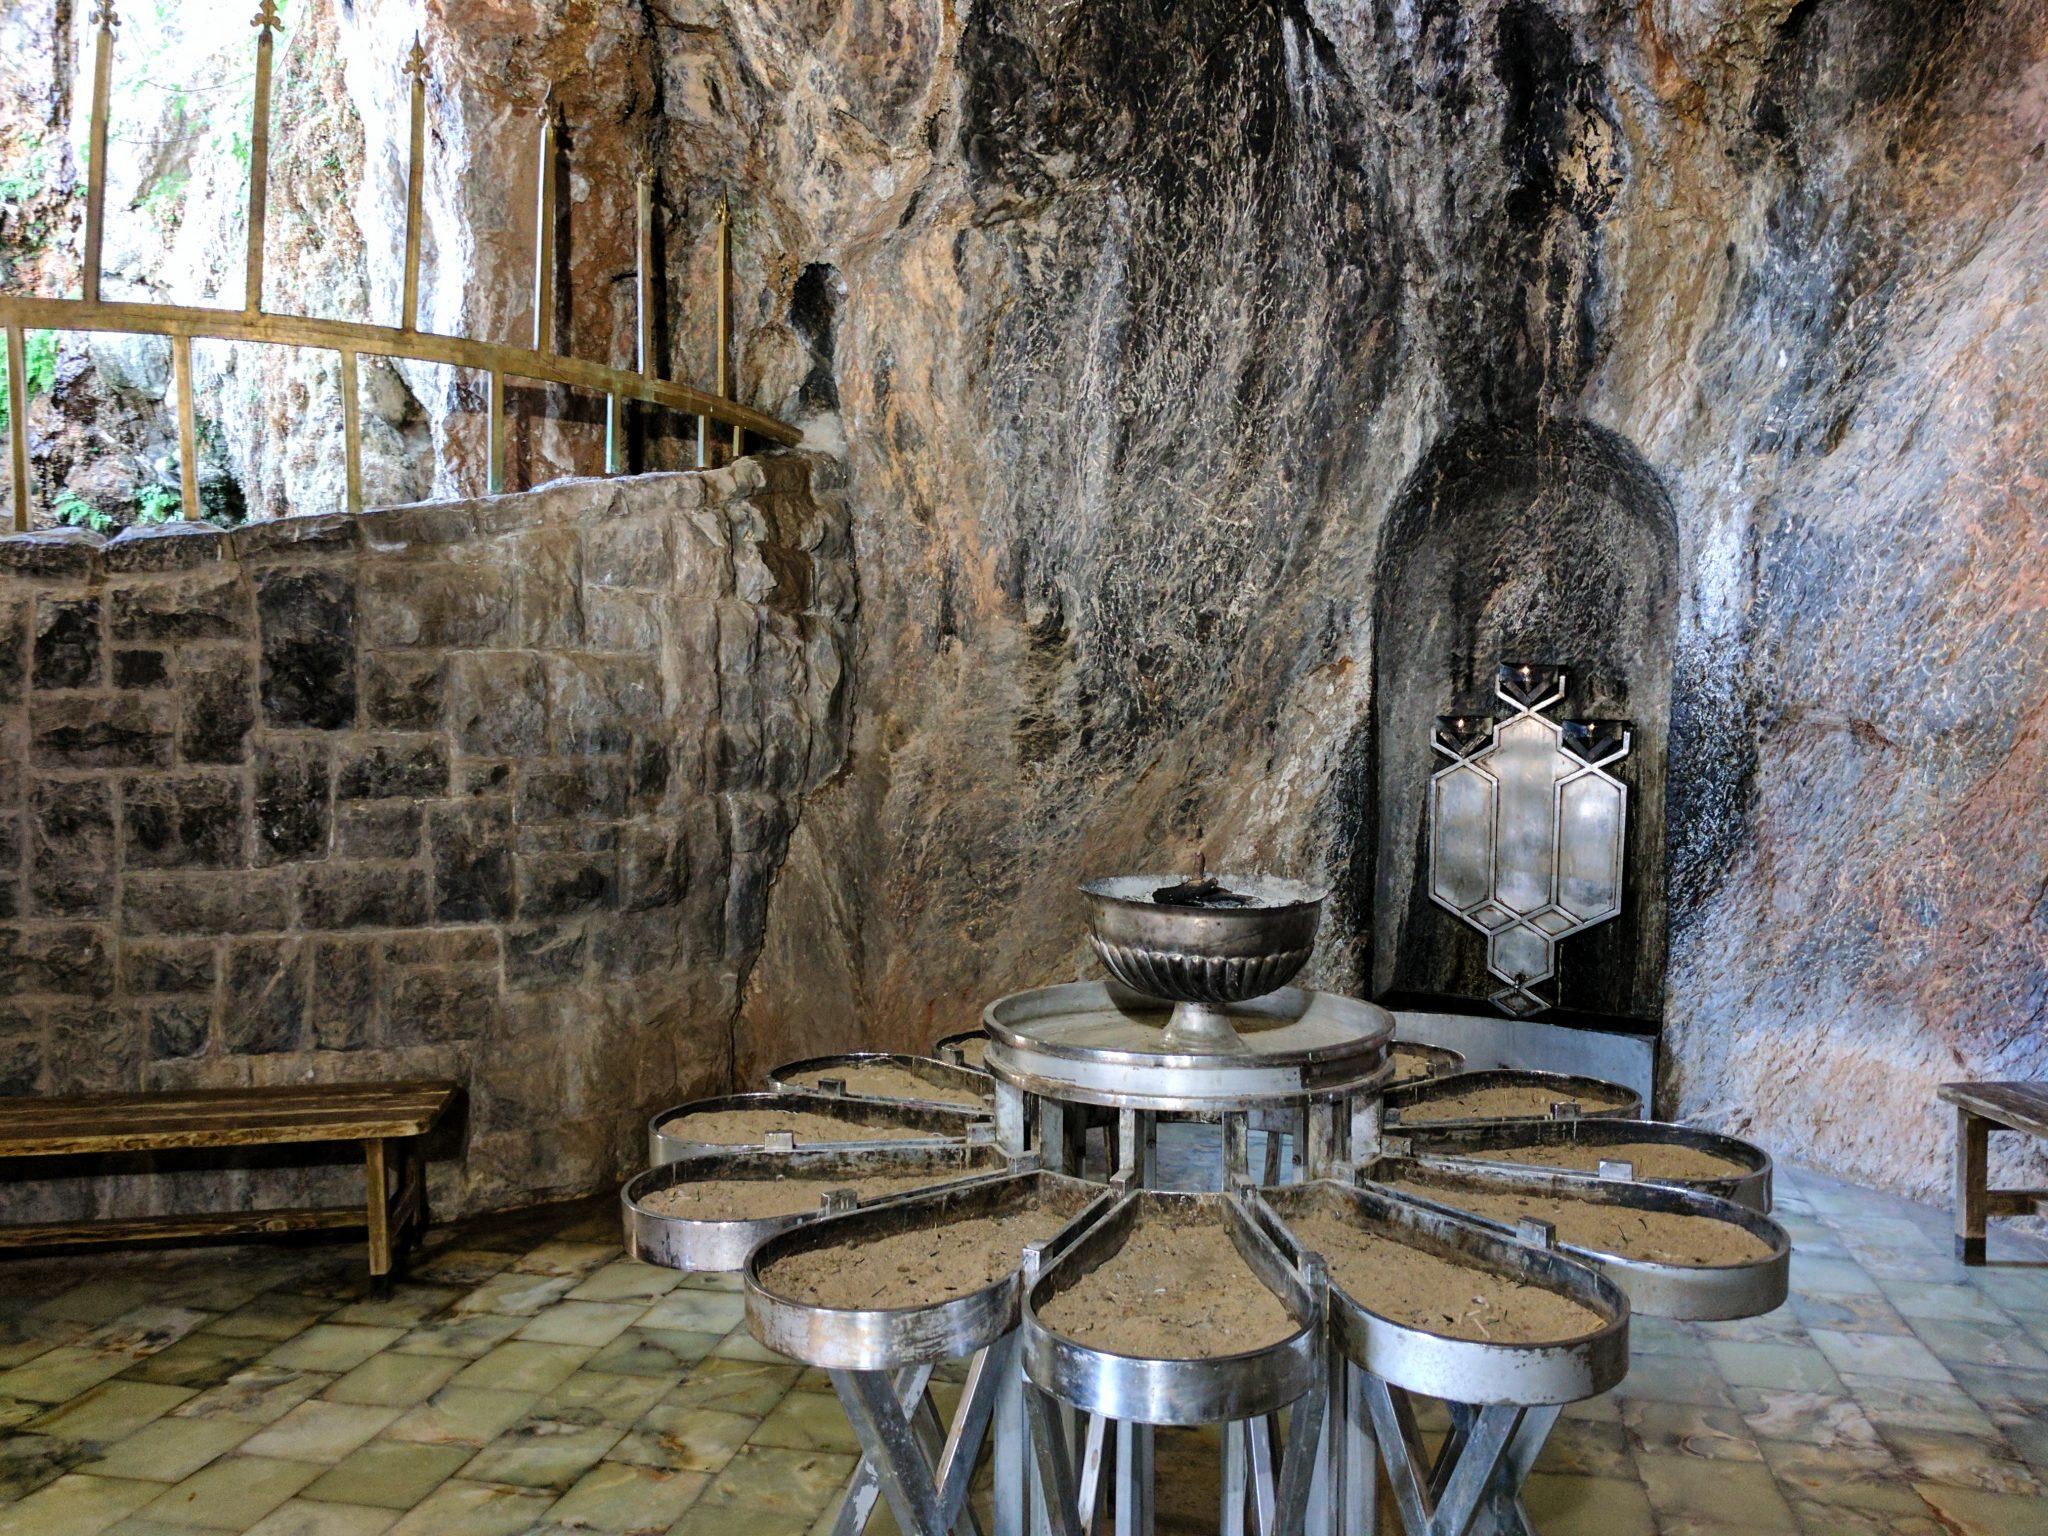 Pir-e Sabz Fire Temple